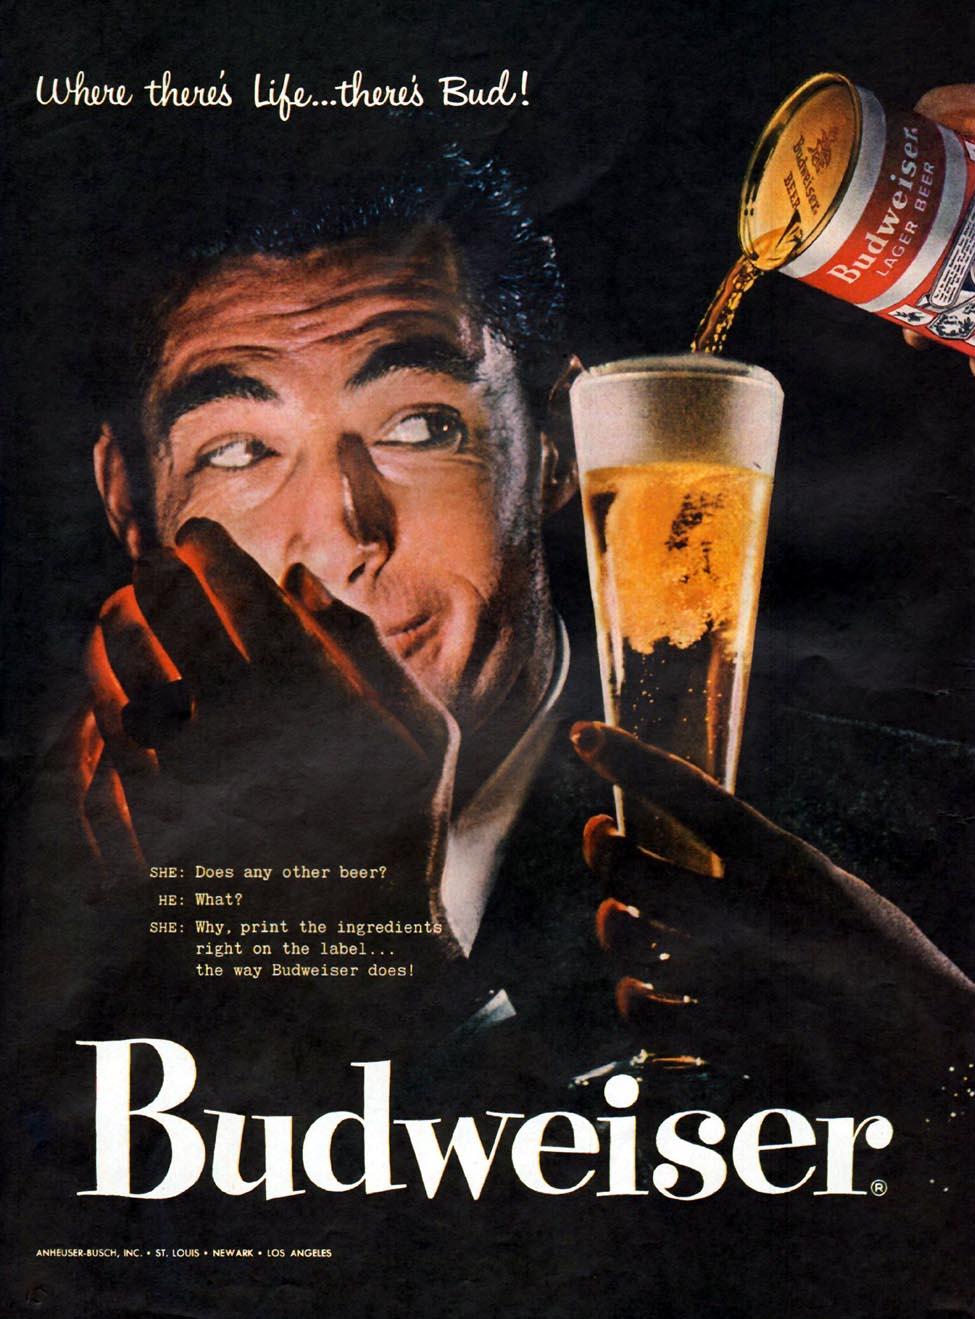 BUDWEISER BEER LIFE 09/09/1957 p. 22